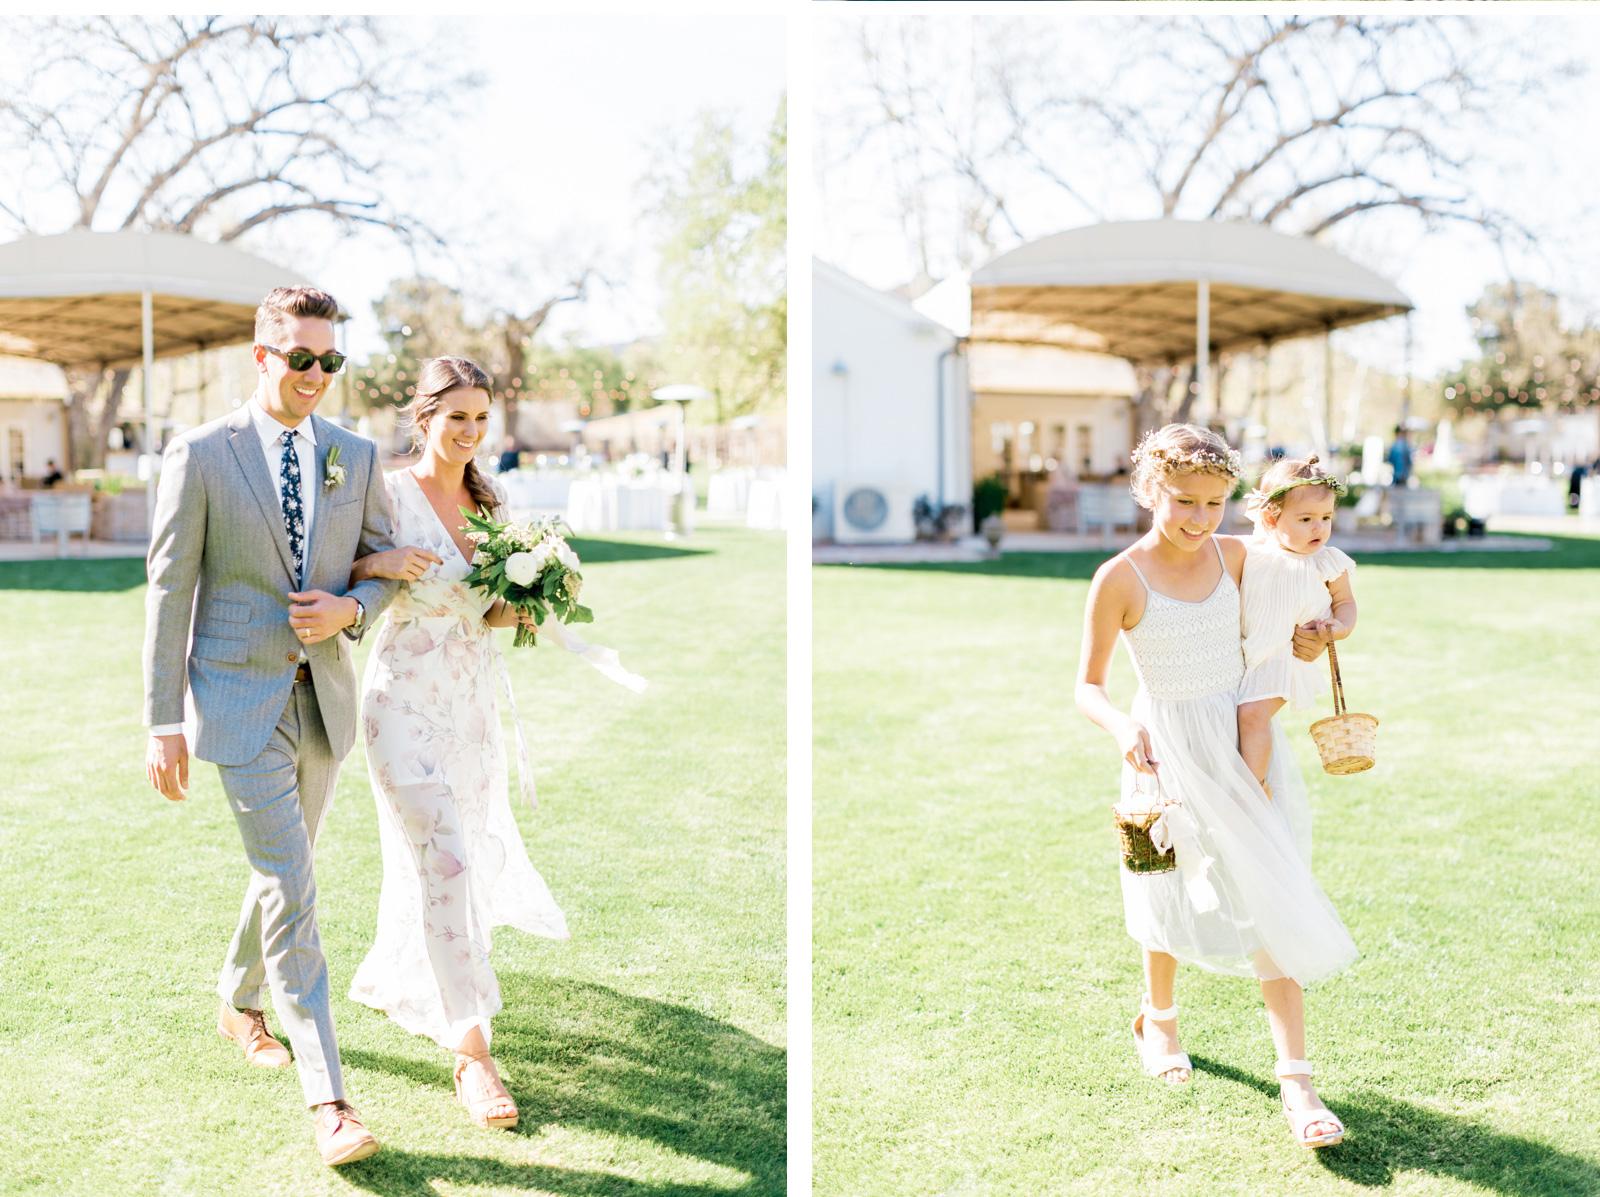 Malibu-Wedding-Photographer-Dani-Piercy-Inspired-by-This-Triunfo-Creek-Wedding-Natalie-Schutt-Photography_05.jpg